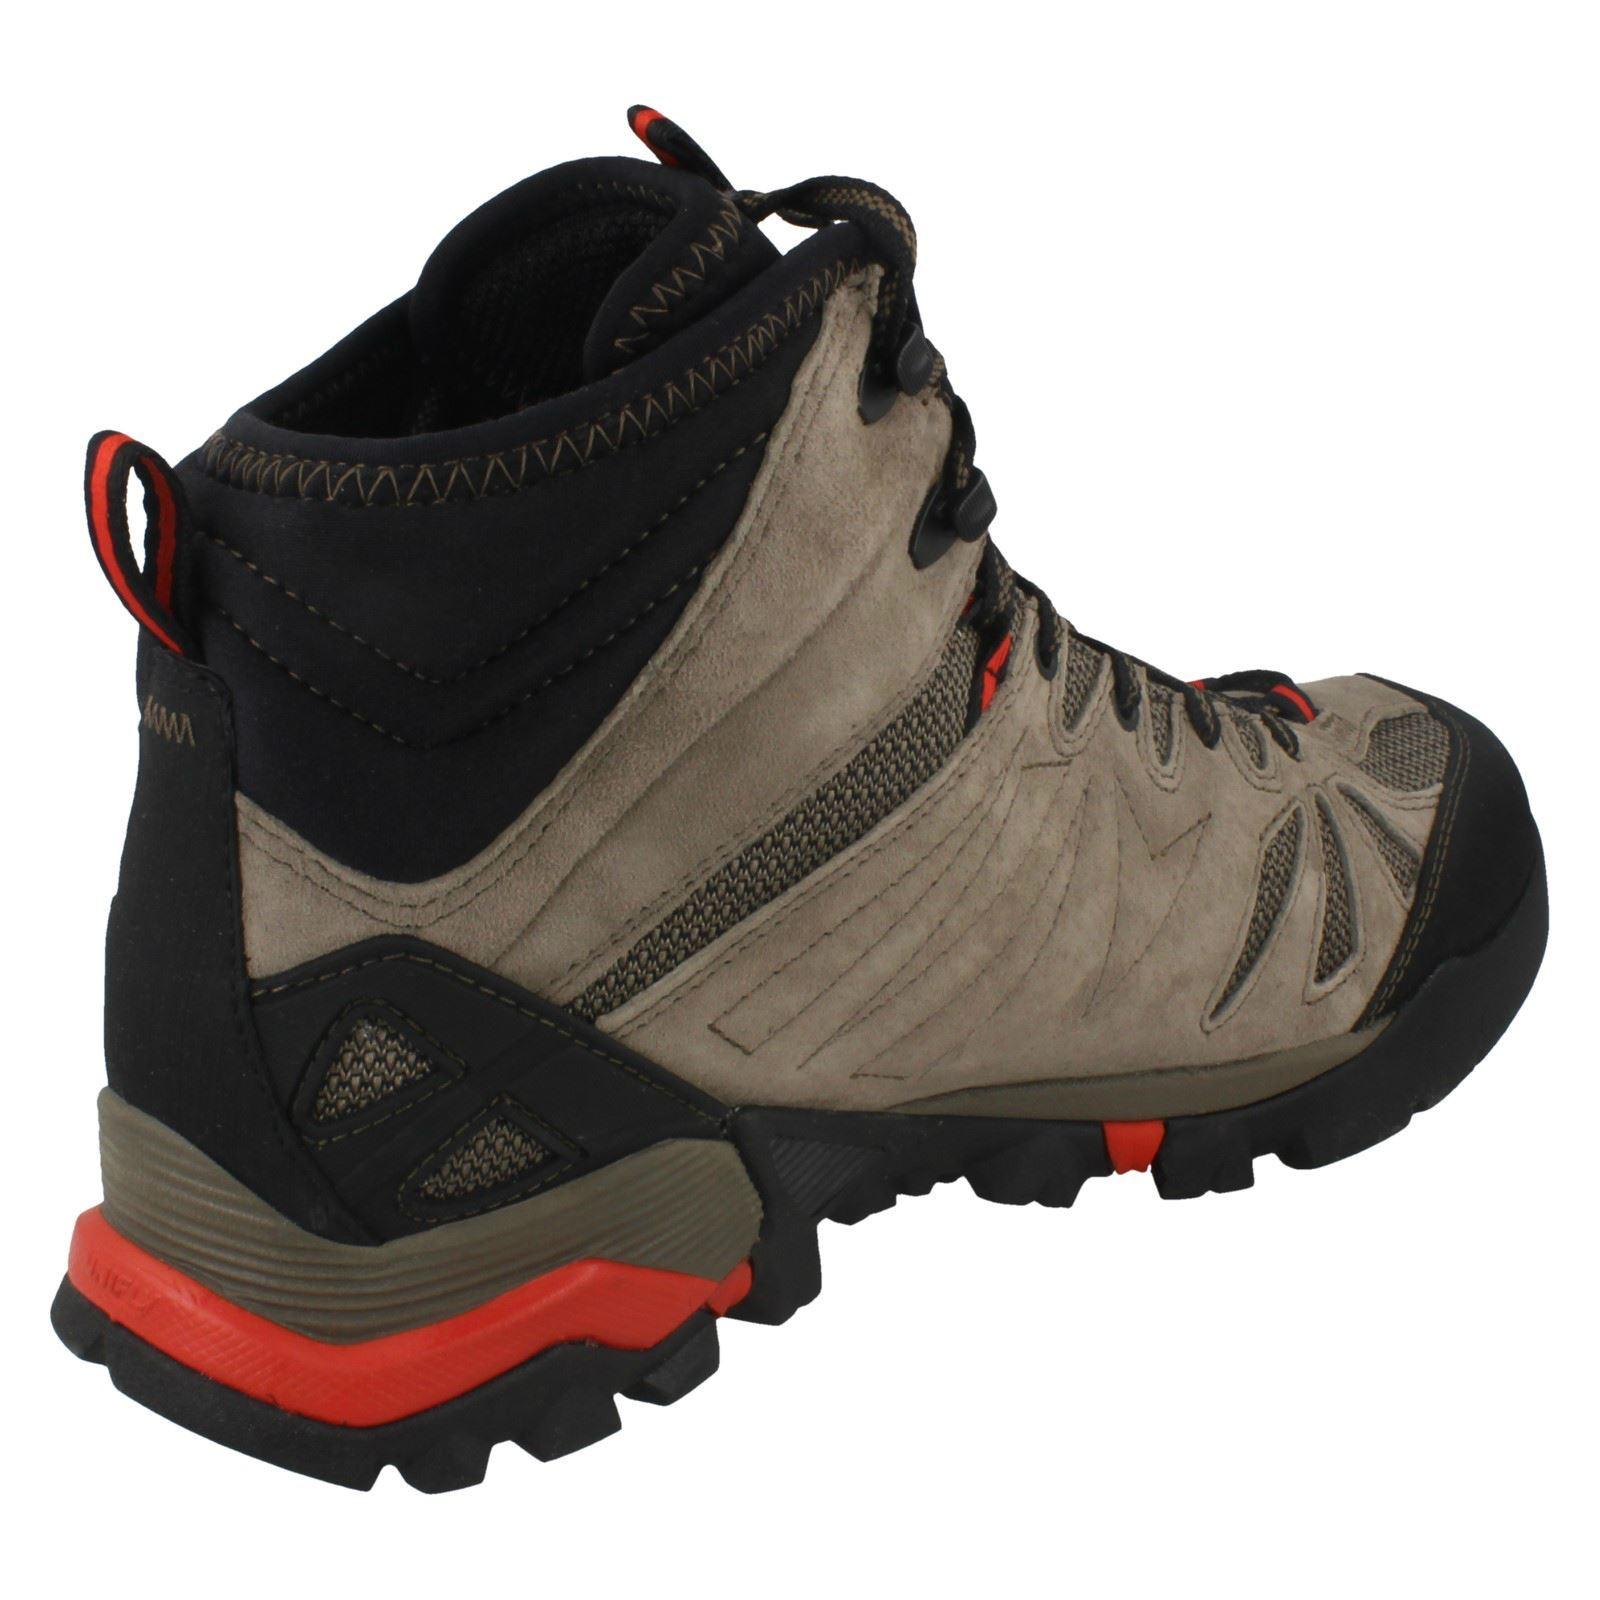 Herren Merrell Walking Stiefel Mid The Style Capra Mid Stiefel Gore-Tex e06a5a